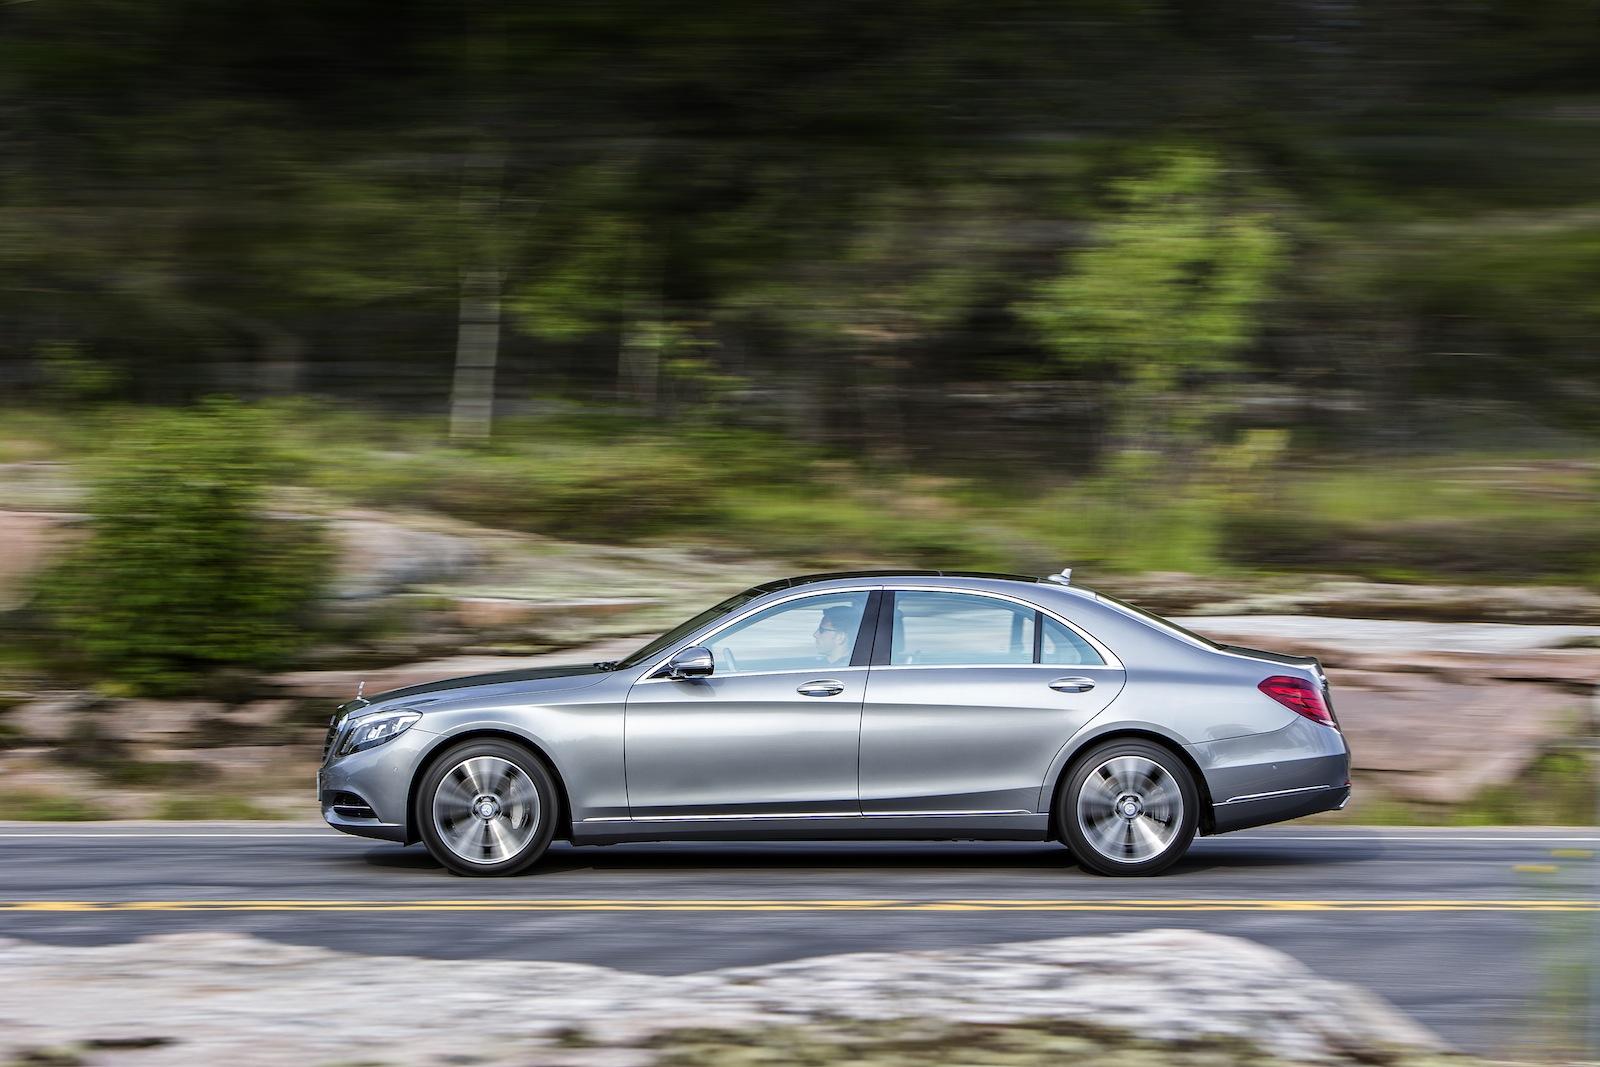 2013 Mercedes Benz S Class Review Photos Caradvice